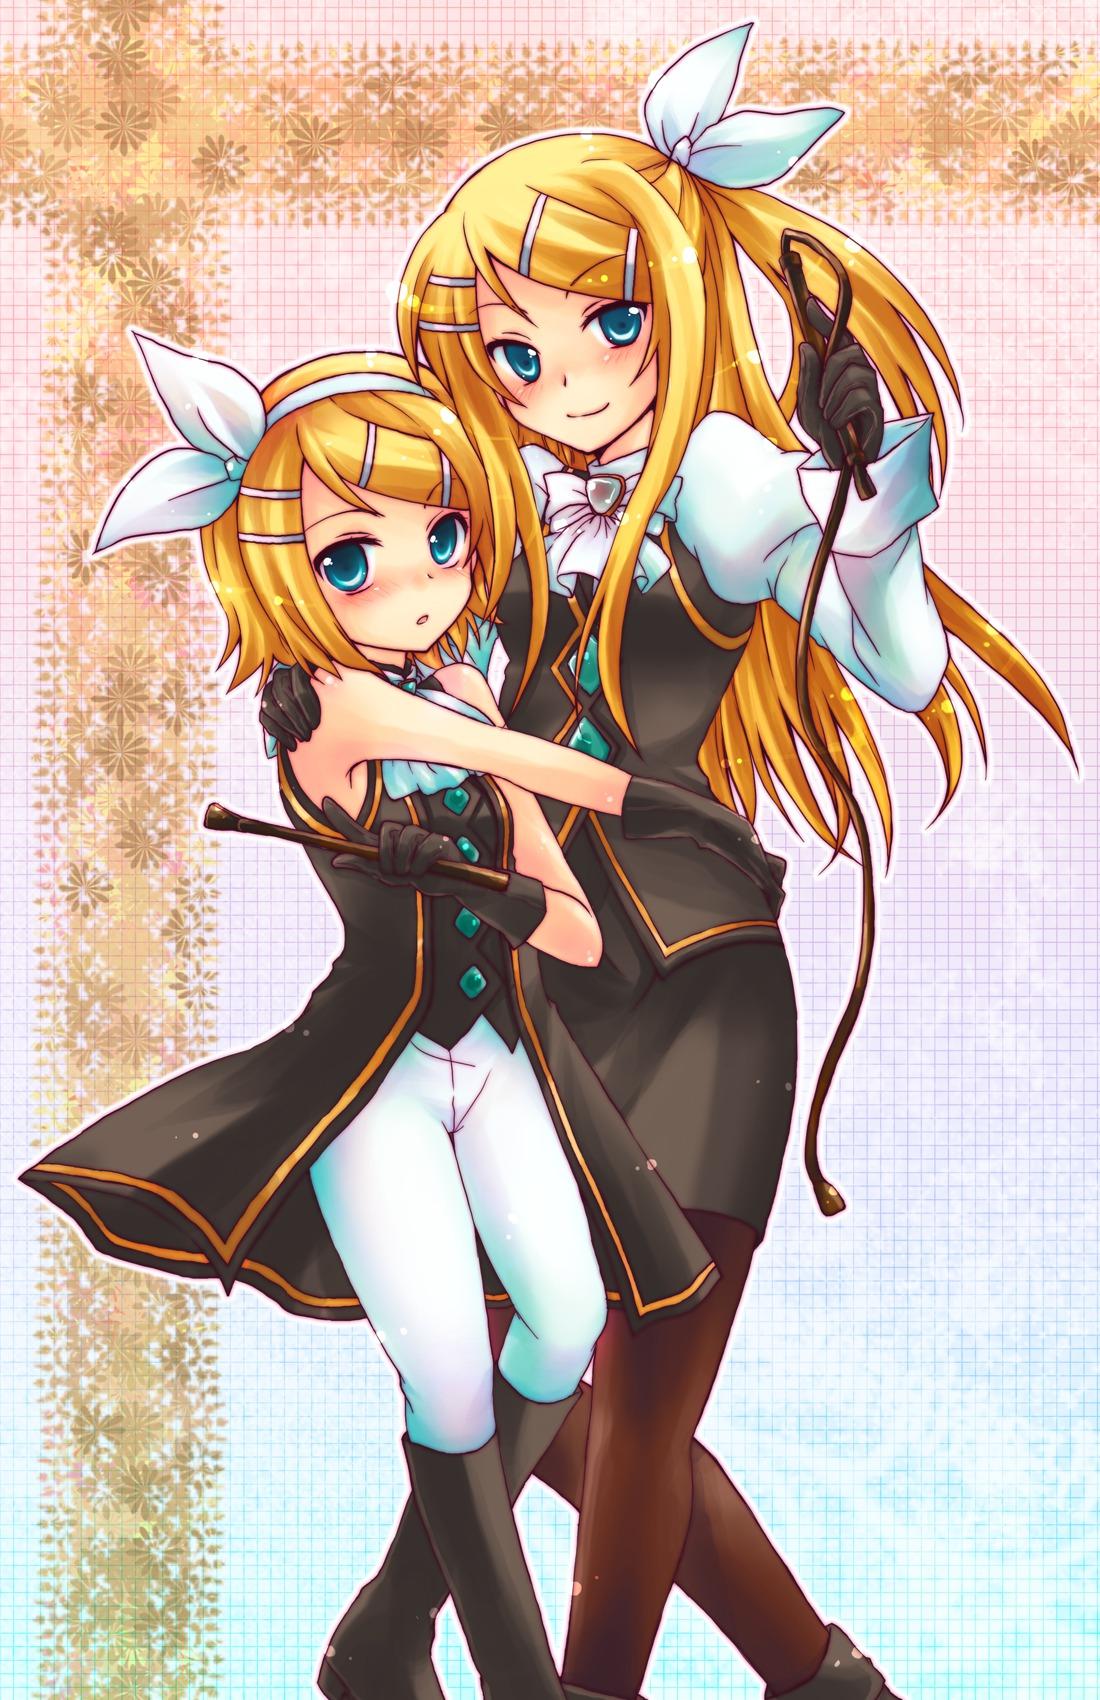 Kagamine Rin/#275943 - Zerochan